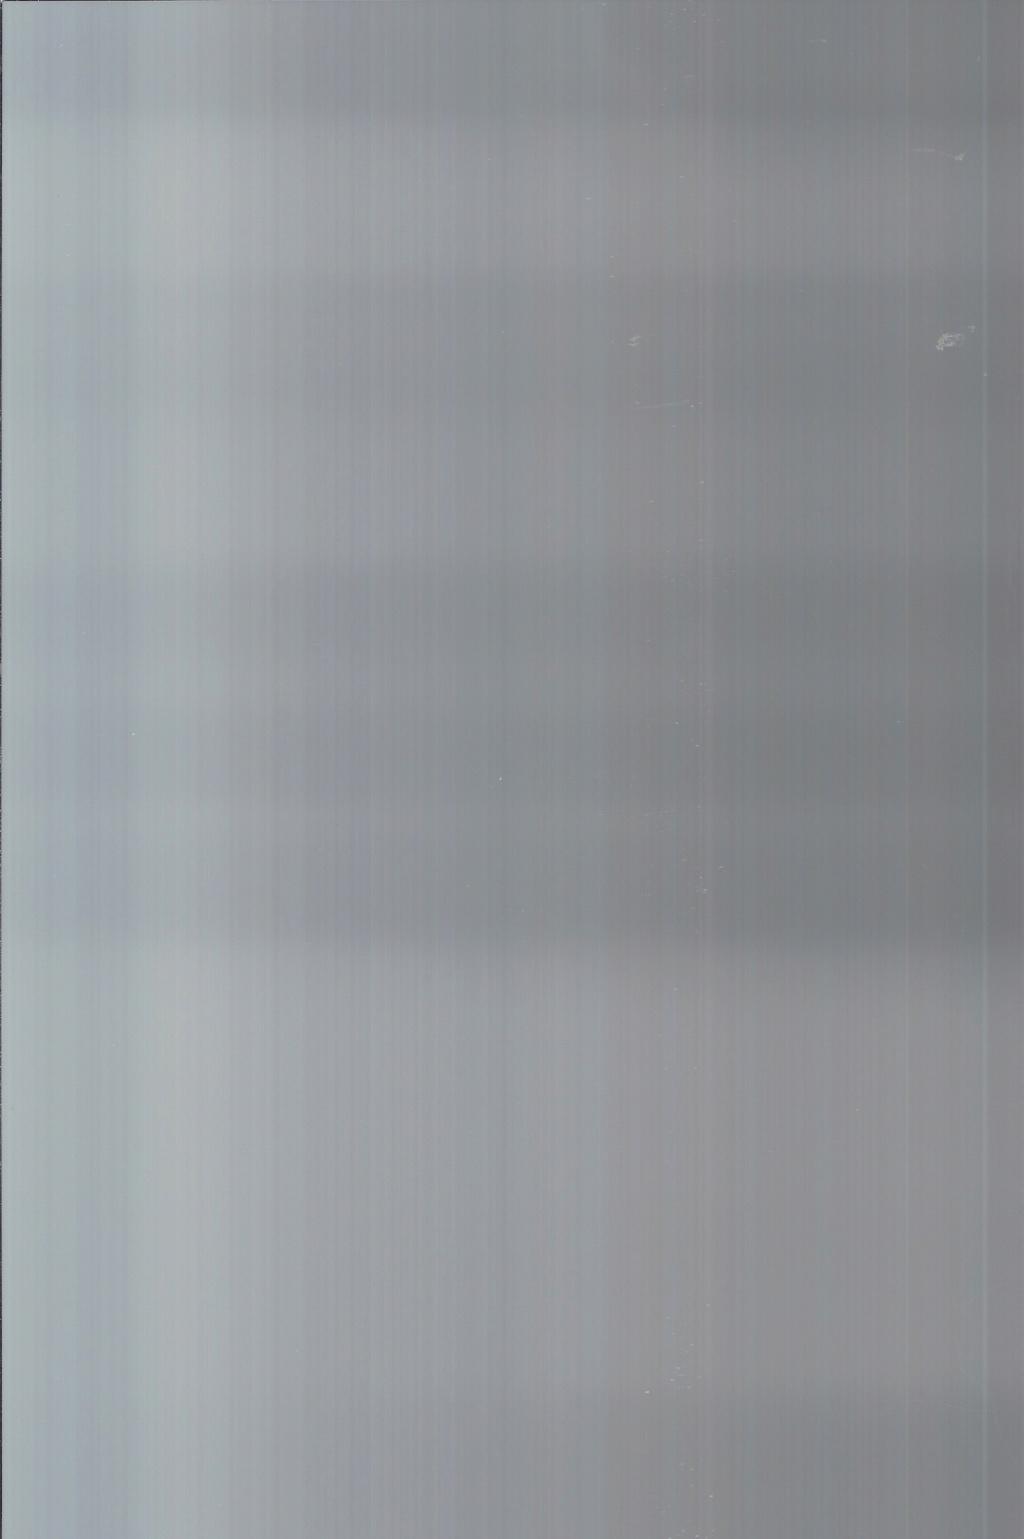 [AIRFIX 2013] Catalogue 2013 Airf1771